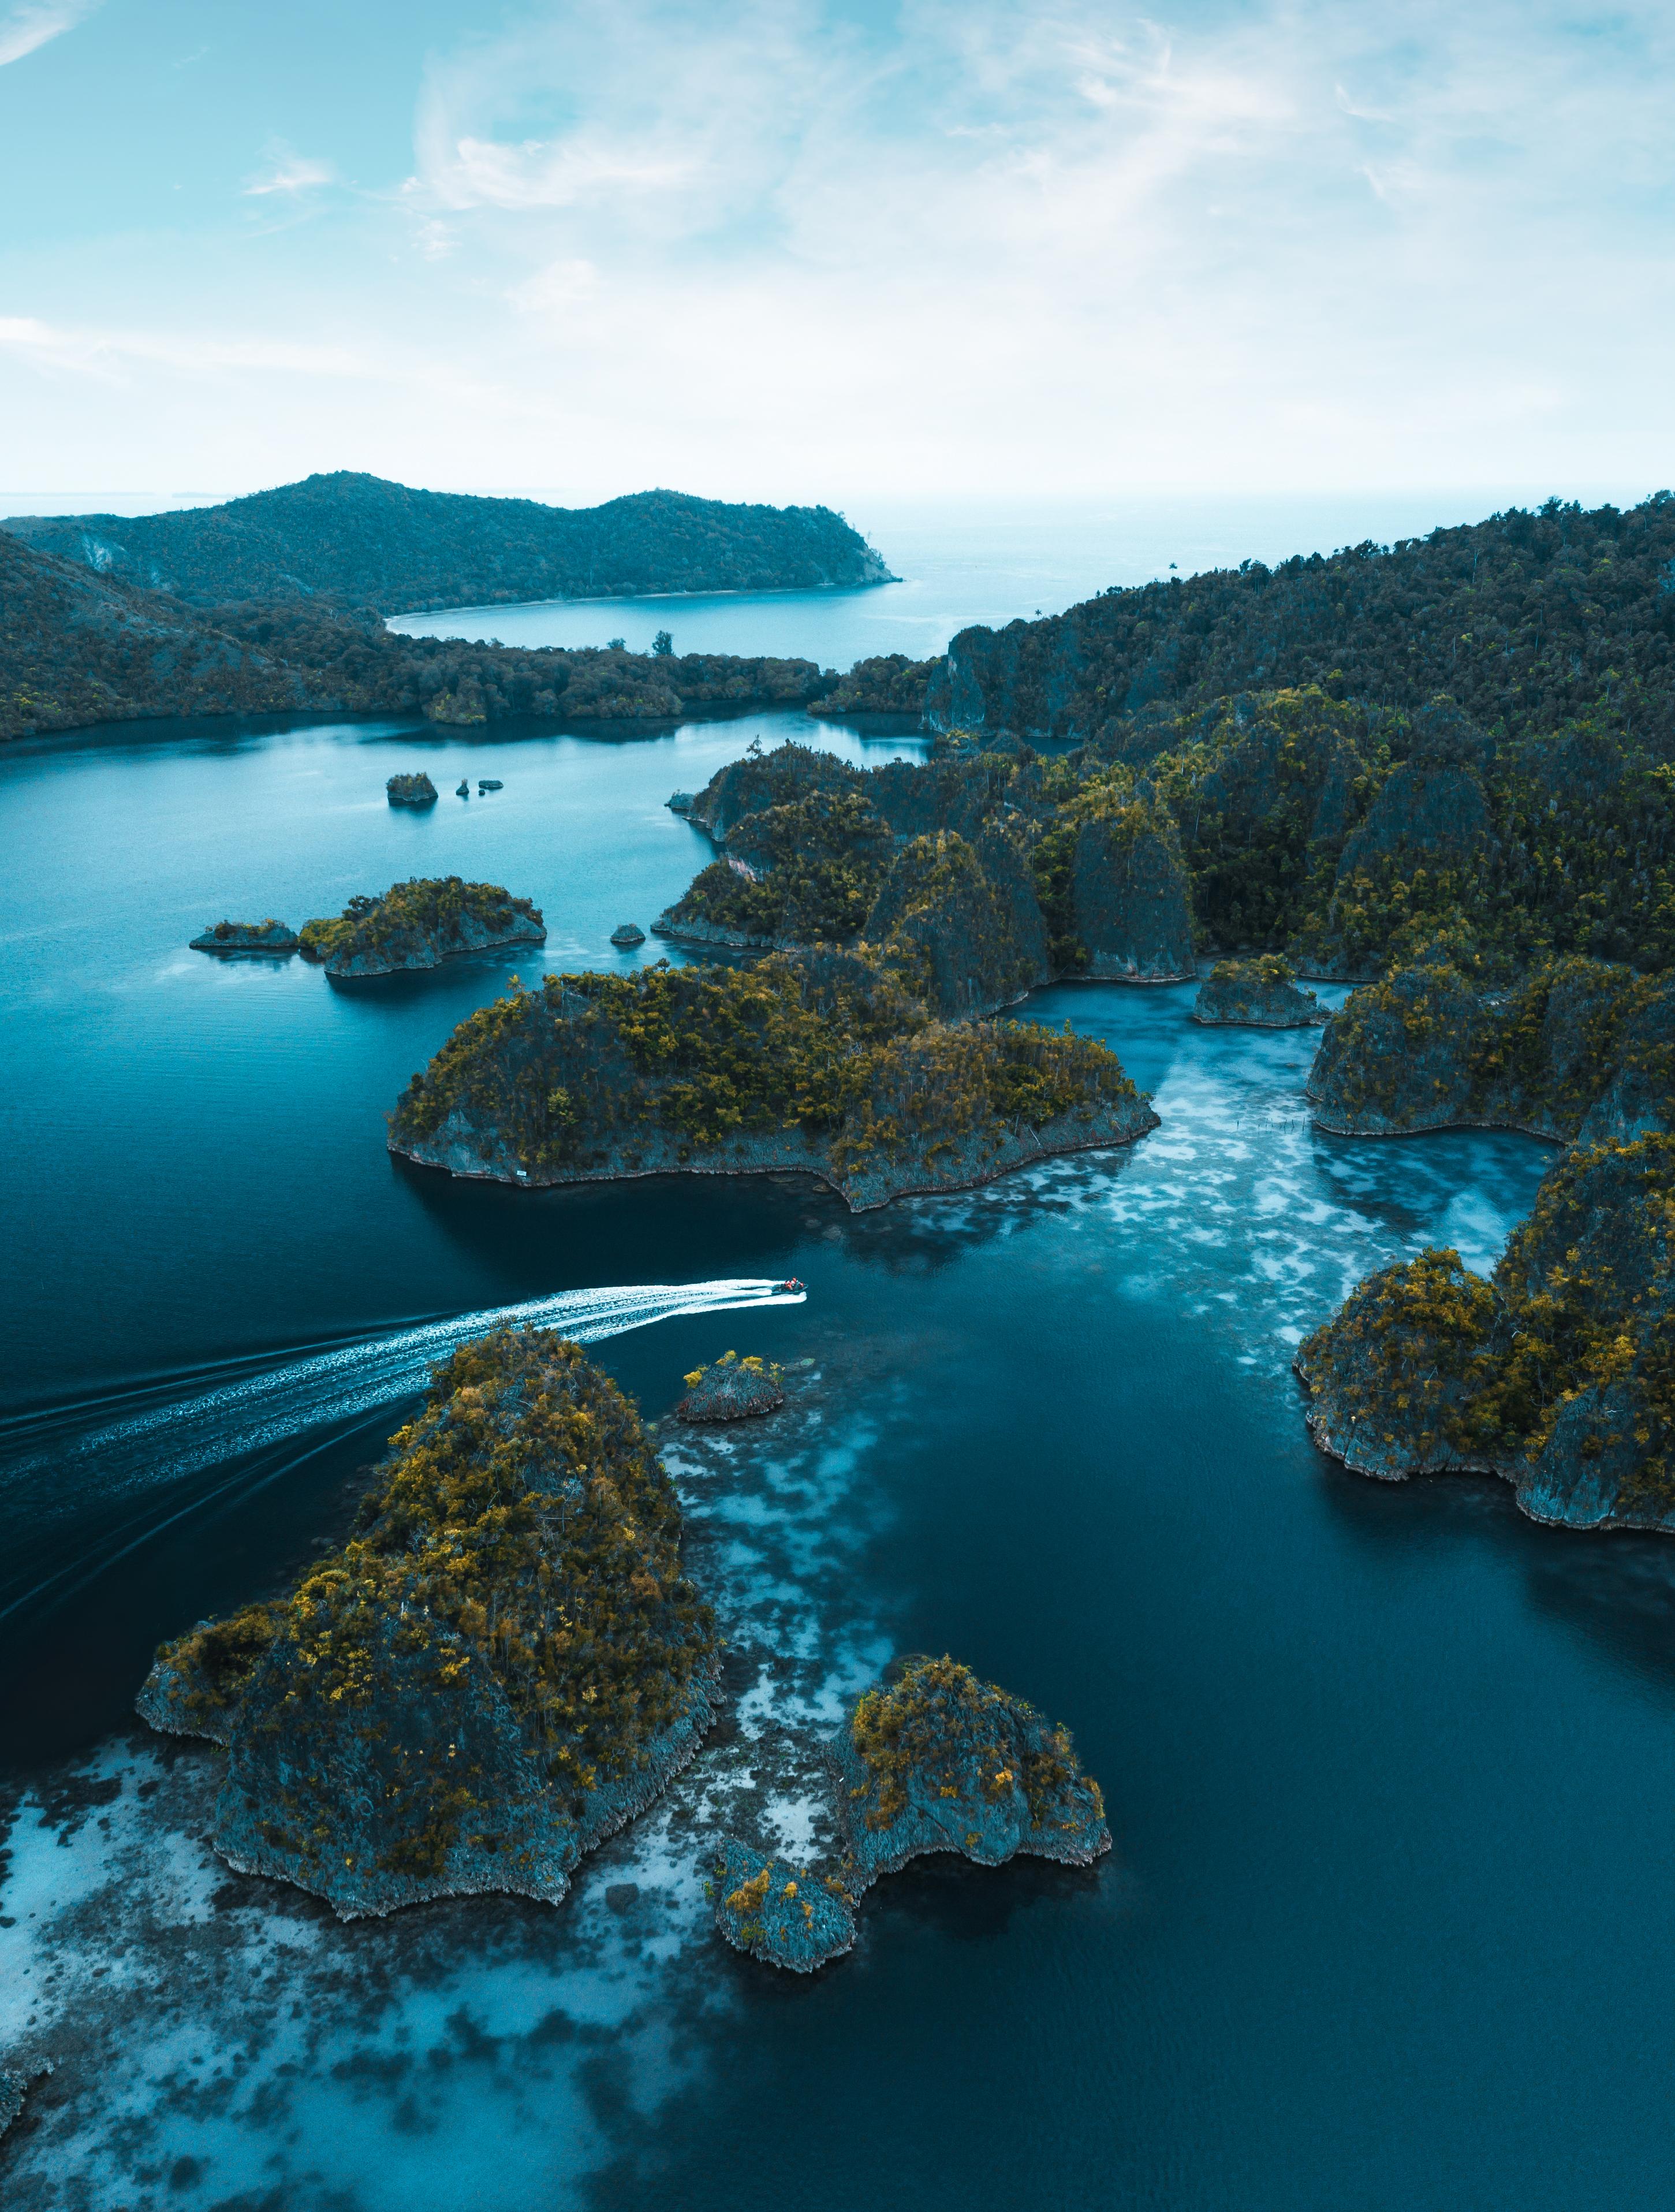 Aerial Photo of Islands on Sea